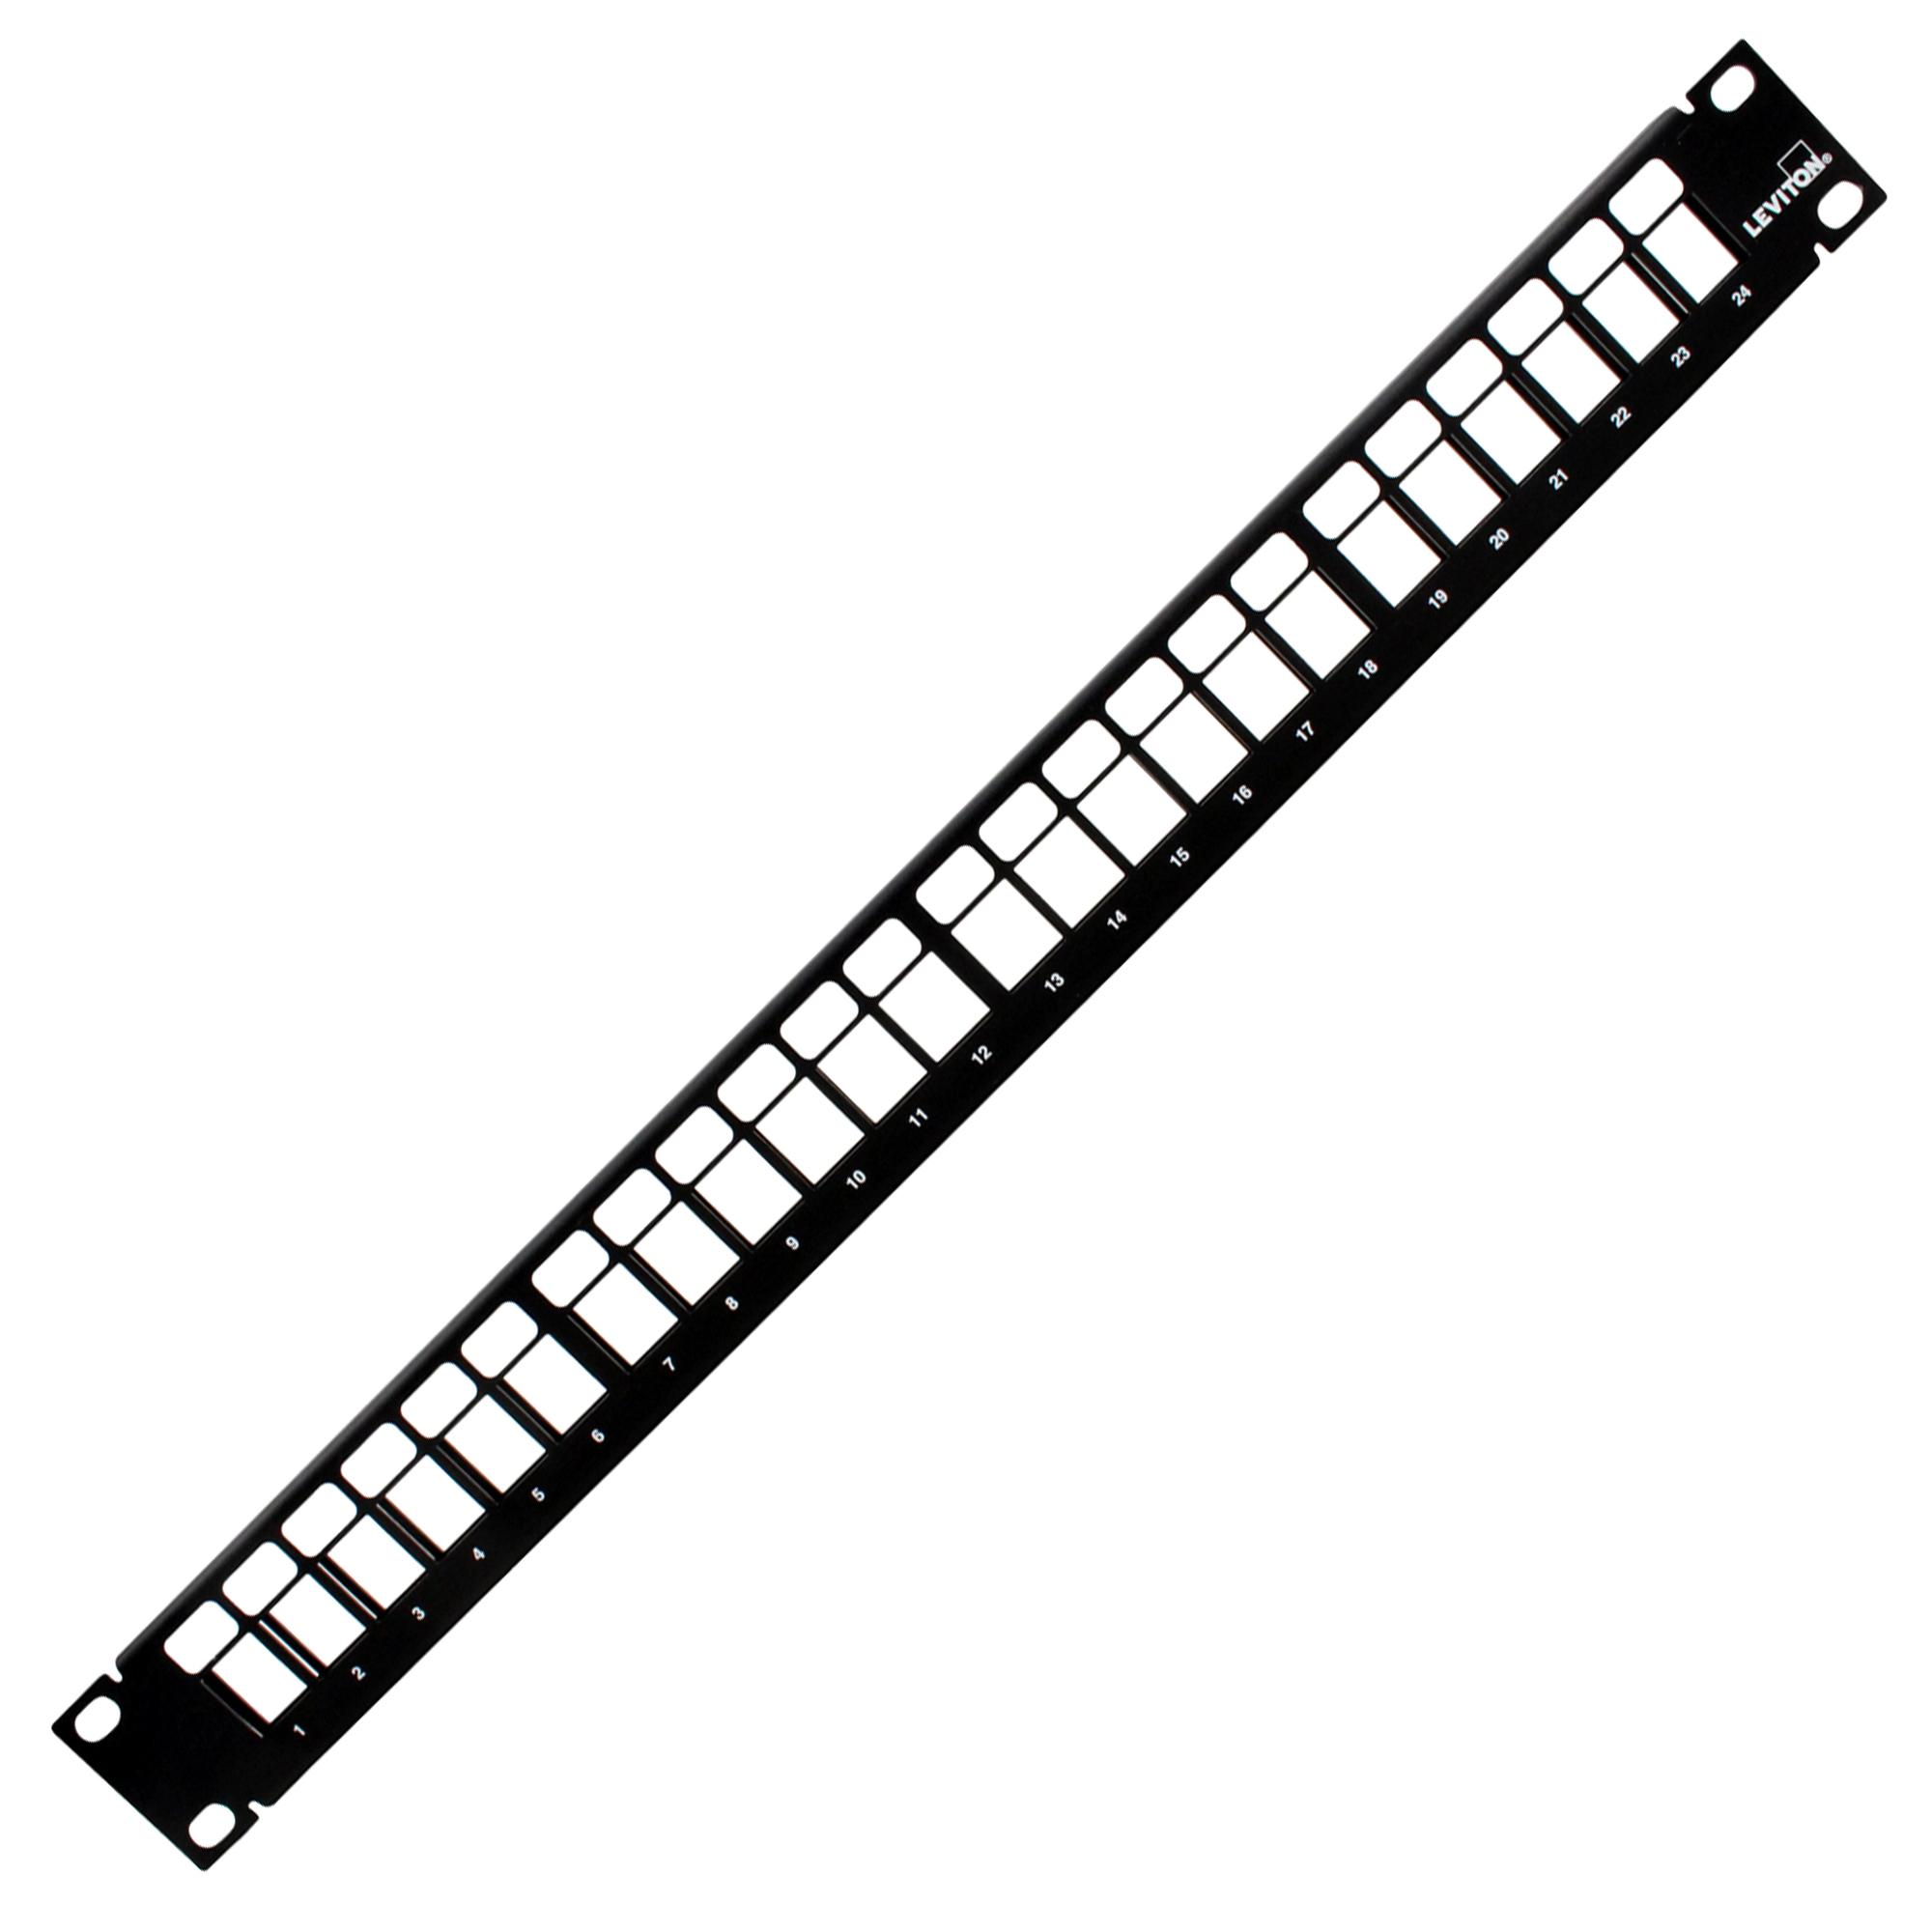 LEVITON 49255-H24 QUICKPORT 24-PORT PATCH PANEL, CABLE